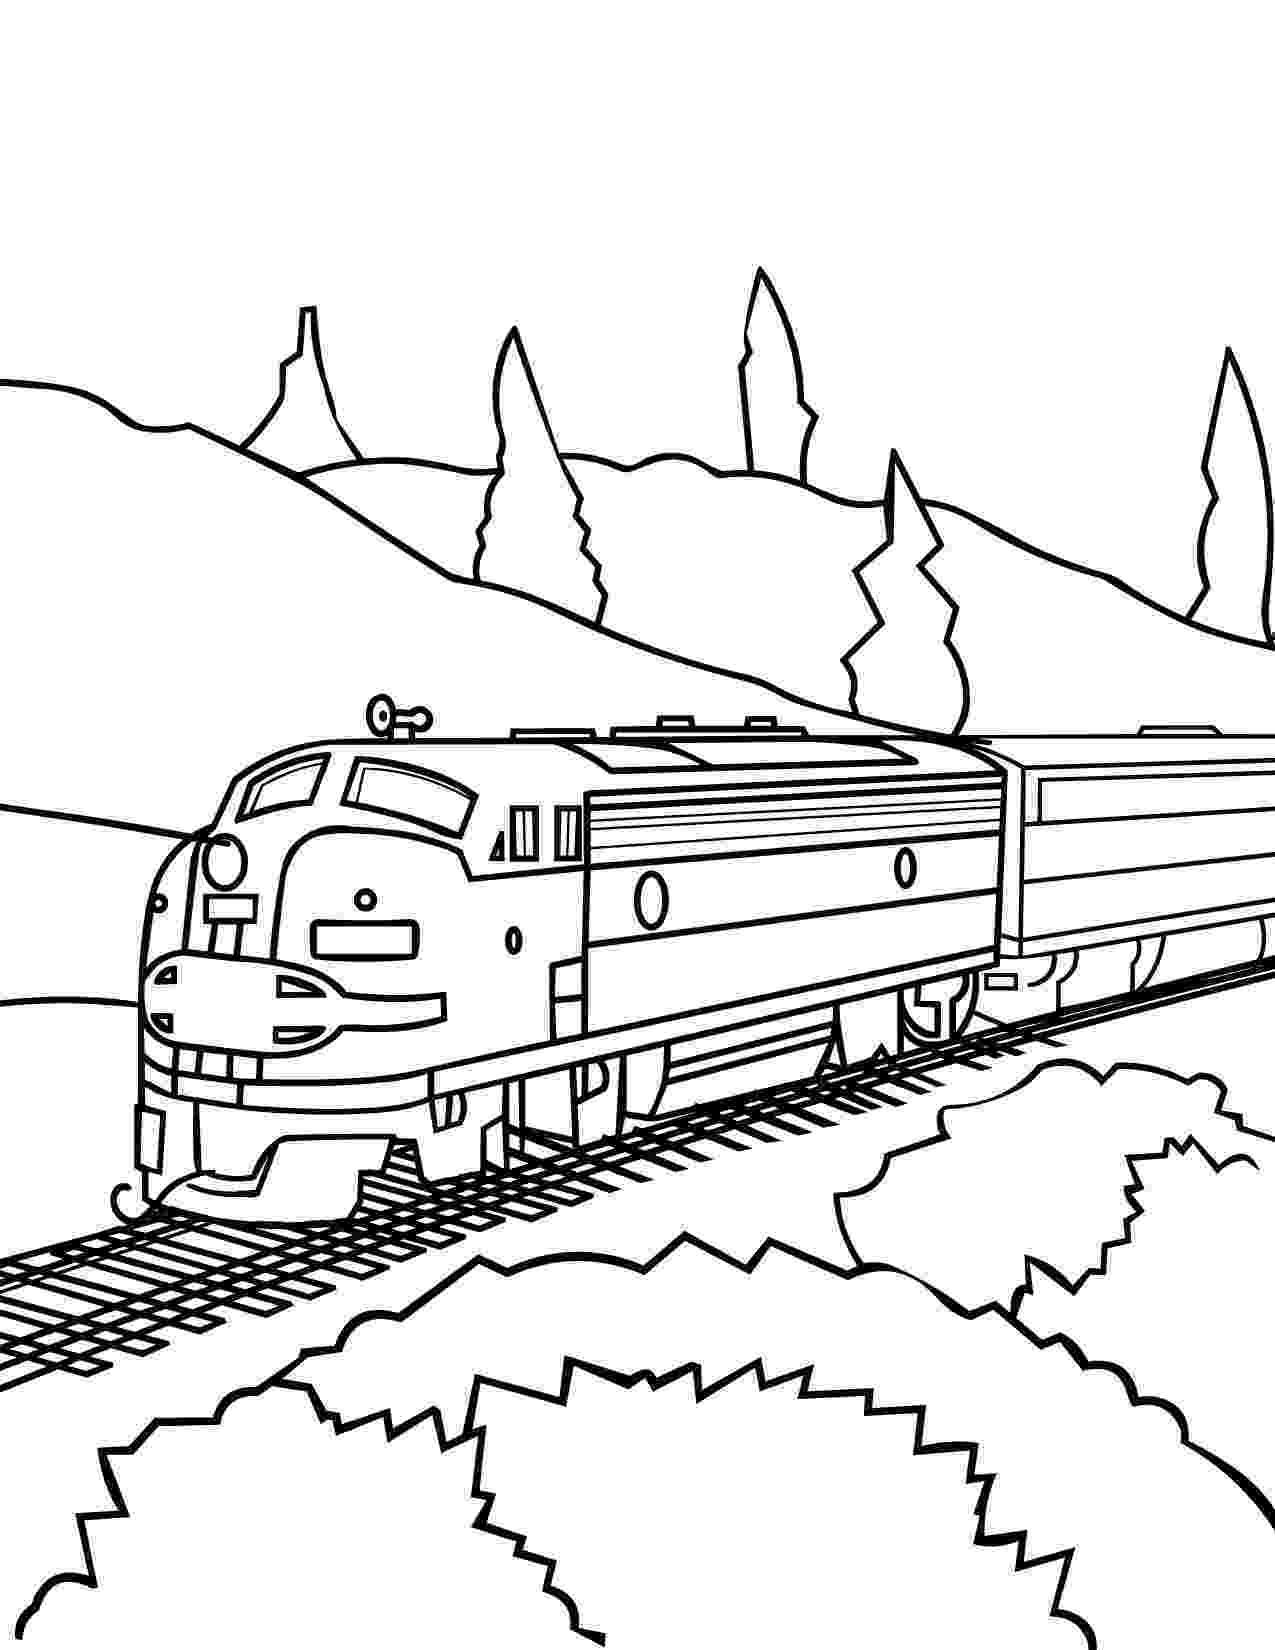 free train coloring pages train coloring pages getcoloringpagescom train coloring pages free